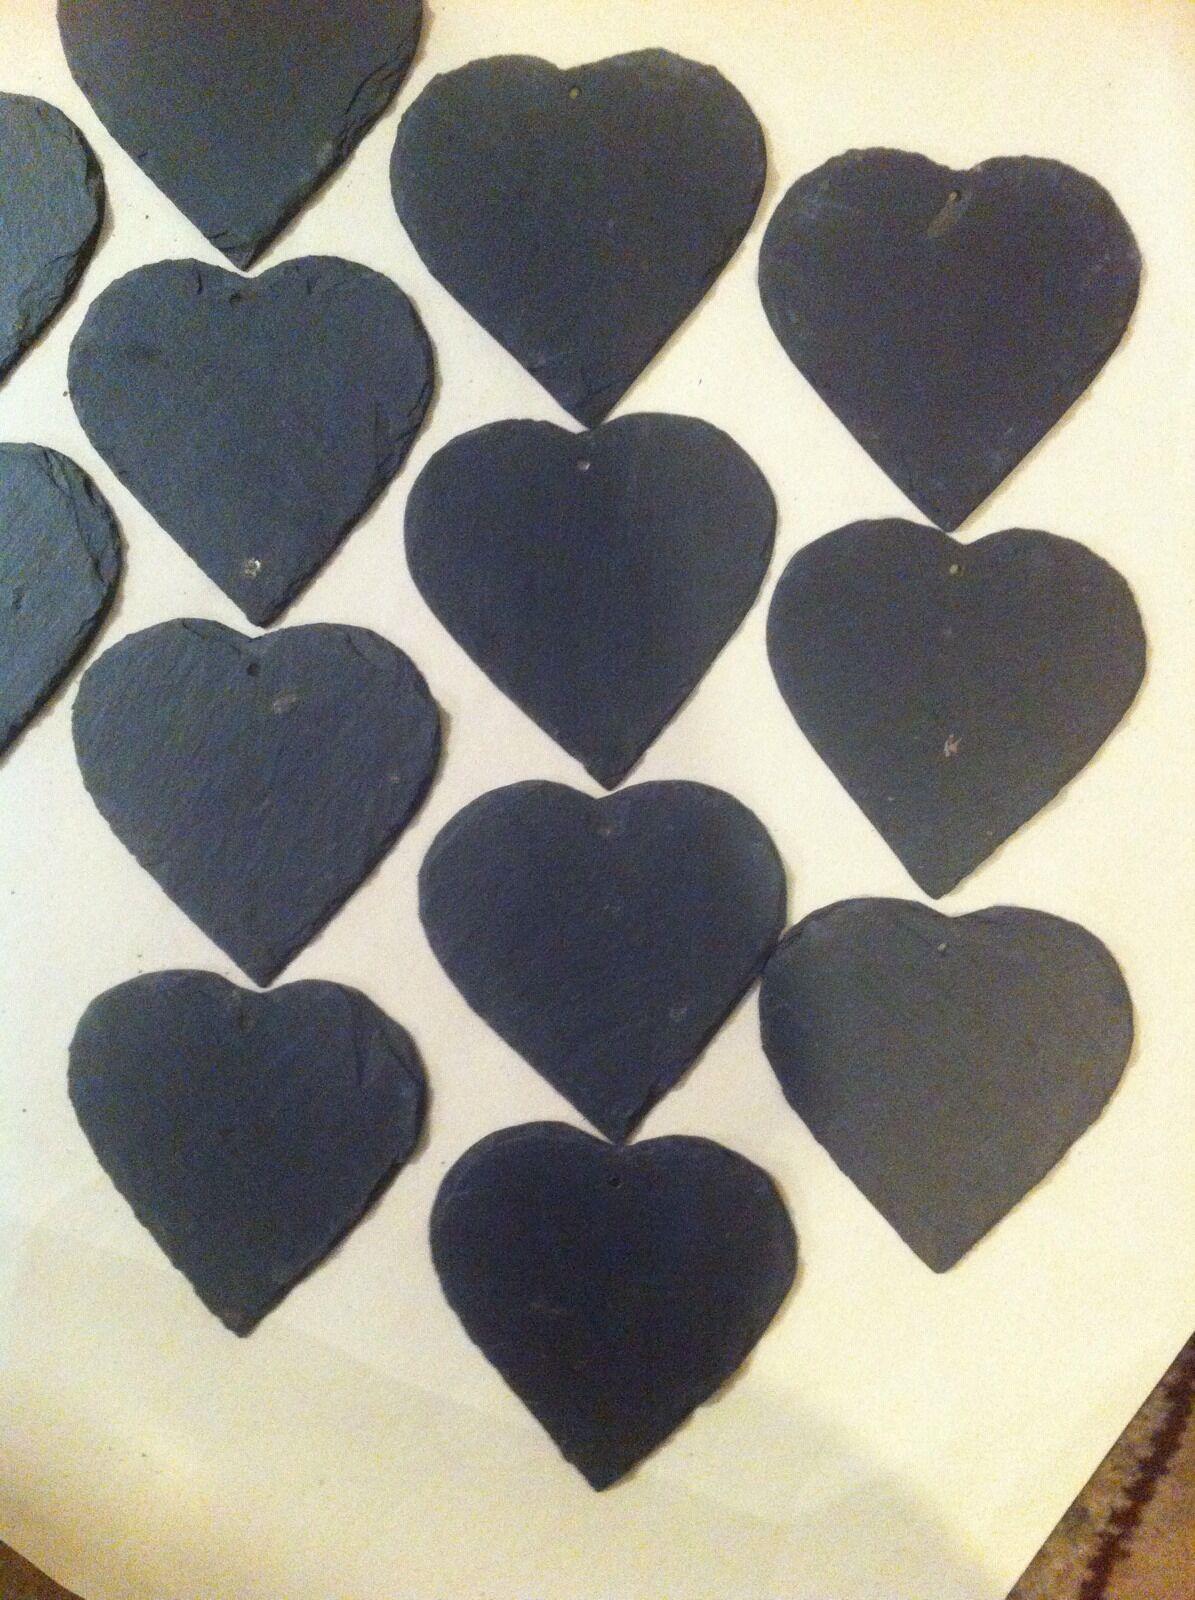 85 xslate coeur mariage faveurs hanging nom tag label place marqueurs 6cm